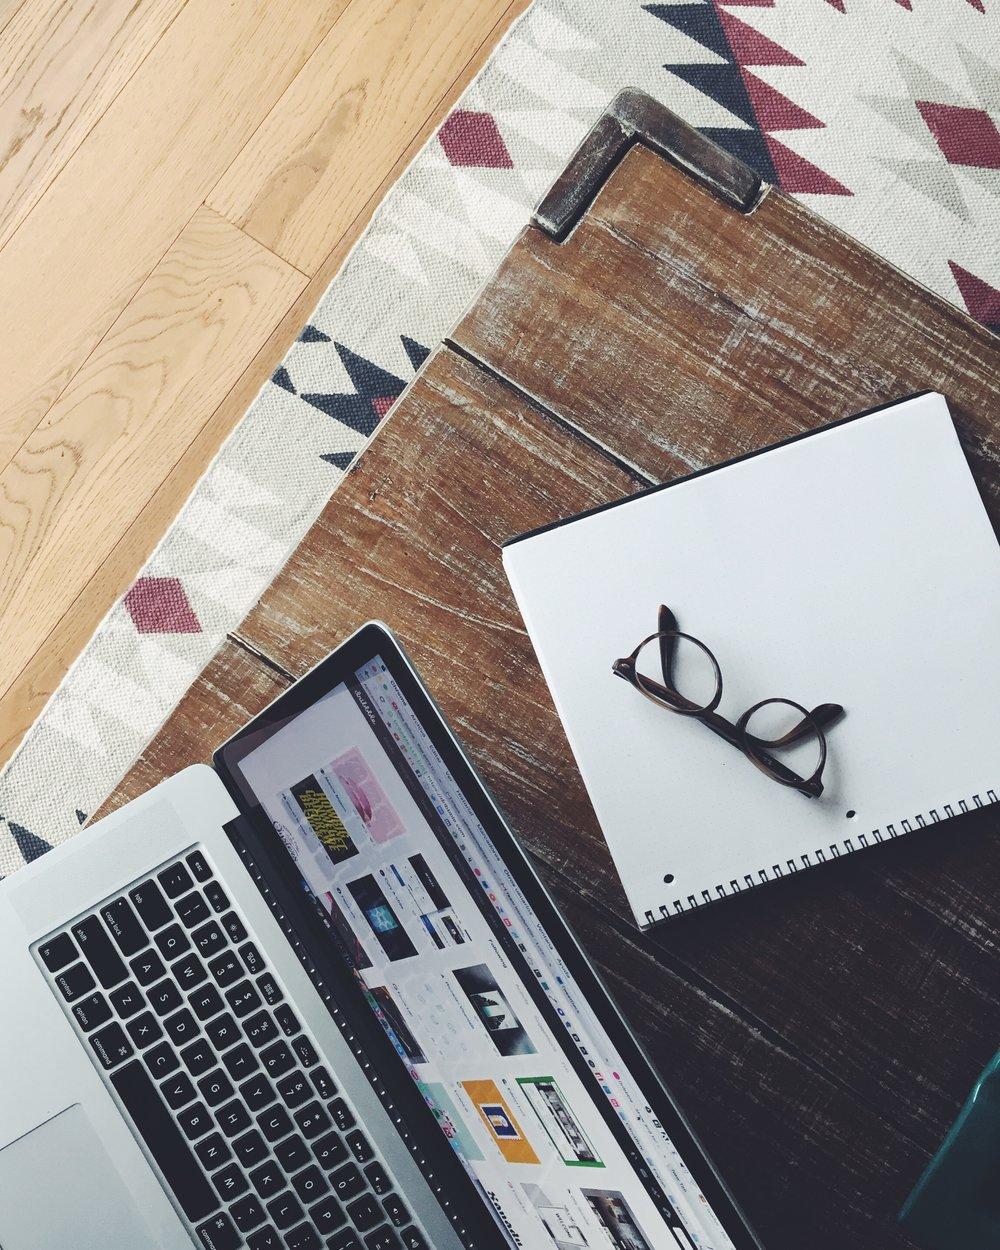 Design Process - Schematic DesignDesign DevelopmentConstruction DocumentationBidding & NegotiationConstruction & Contract Administration